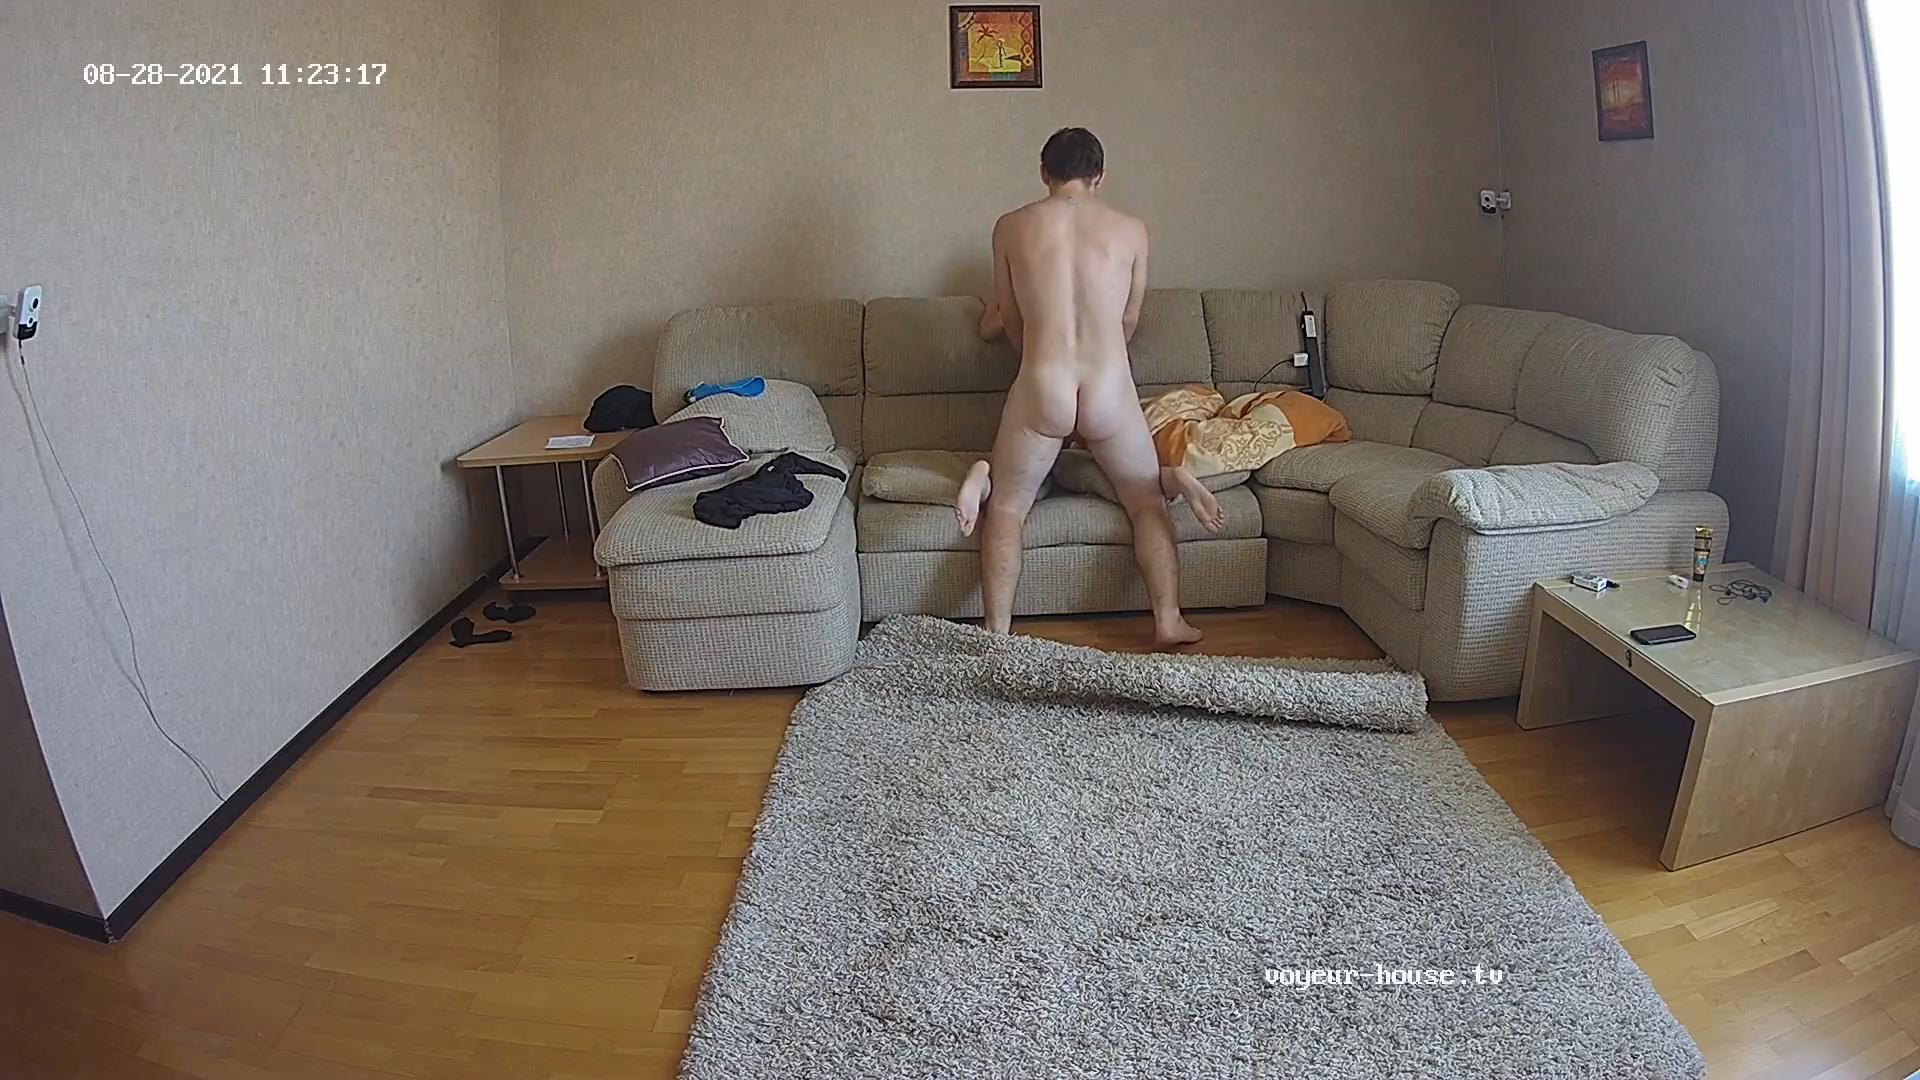 Luchik Arteya Morning sex Aug28 21 cam 3